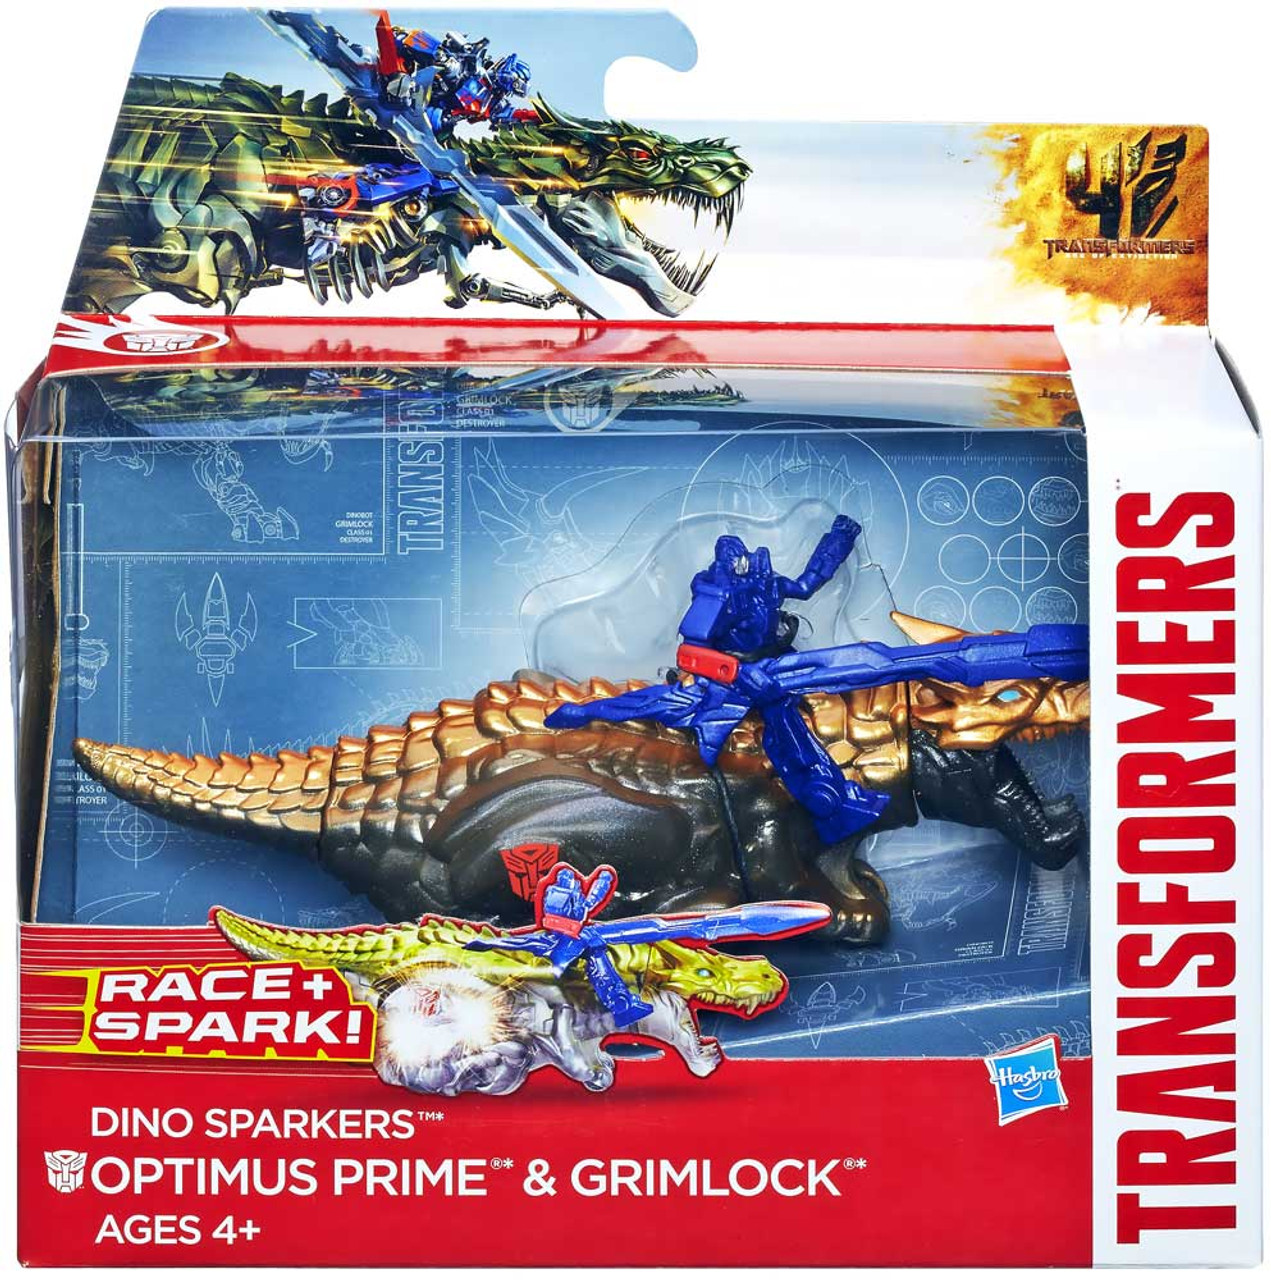 Transformers Age of Extinction Dino Sparkers Optimus Prime & Grimlock Action Figure